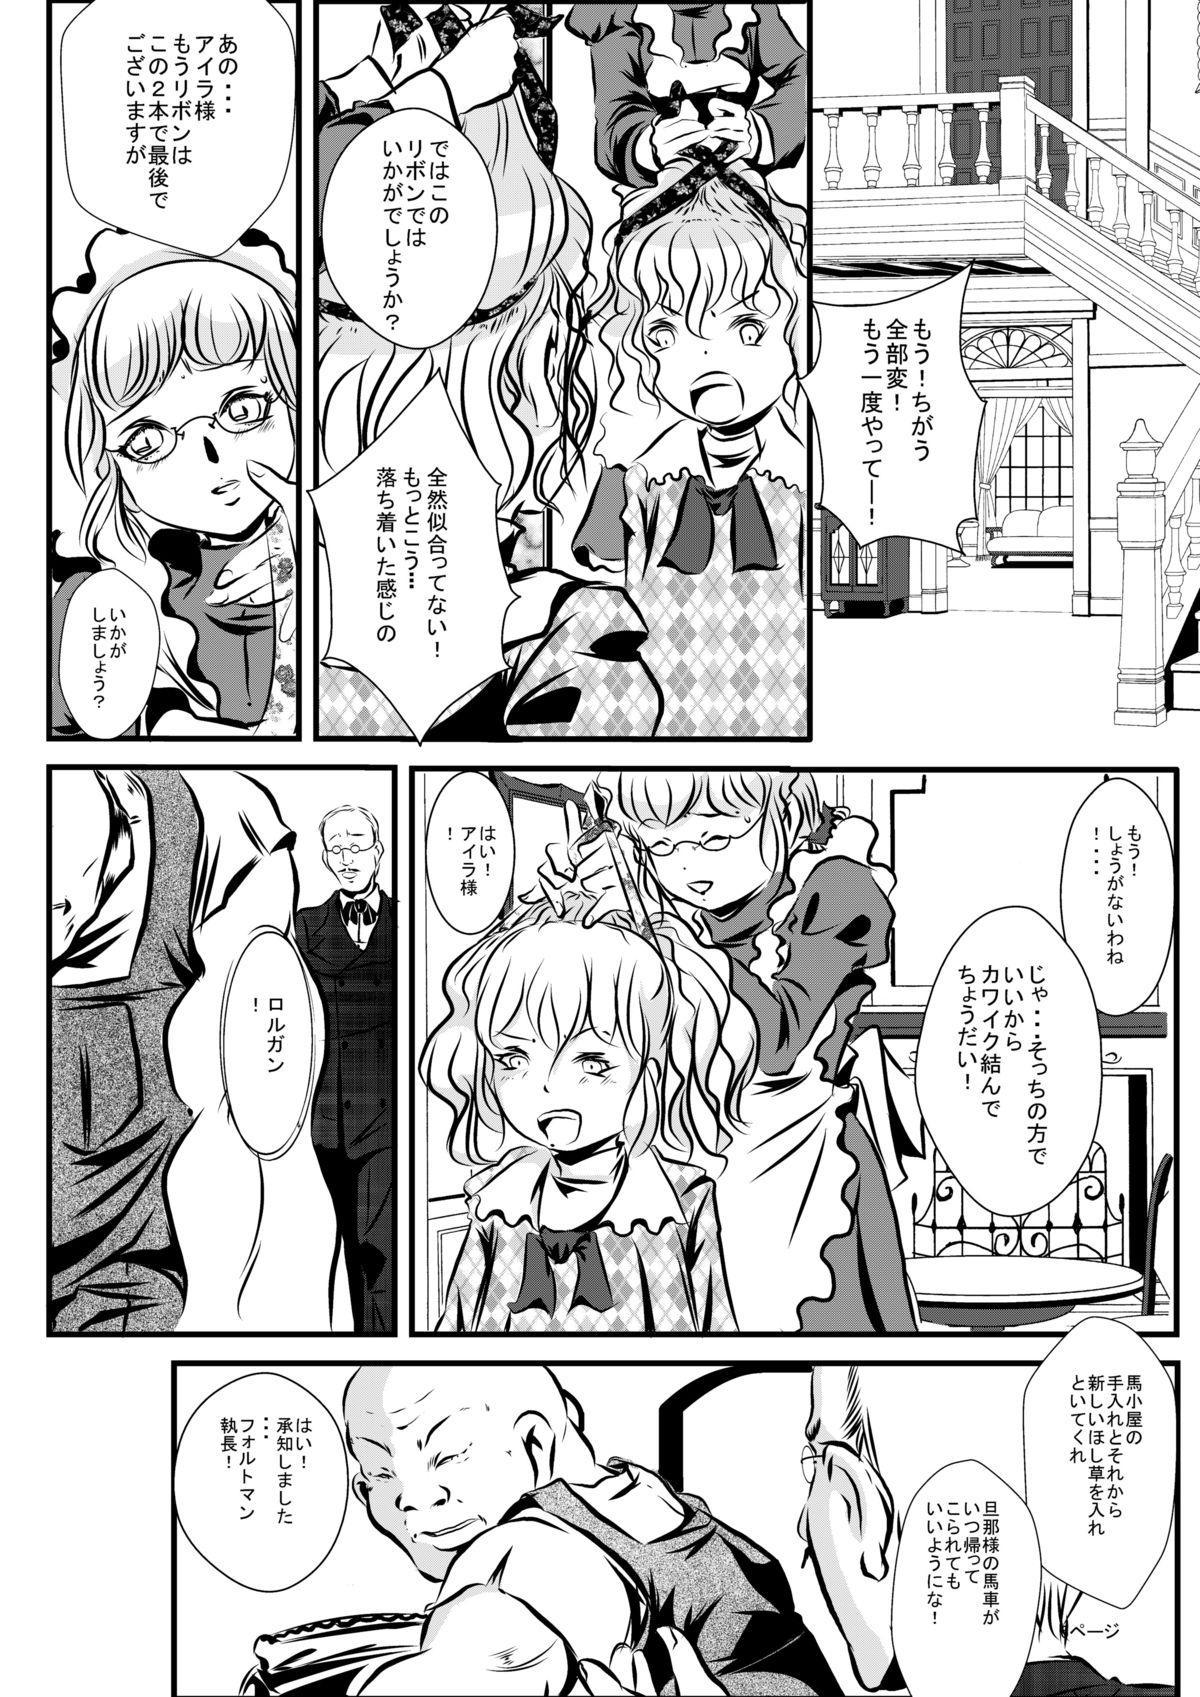 Loli Type no Jikkensitsu 4